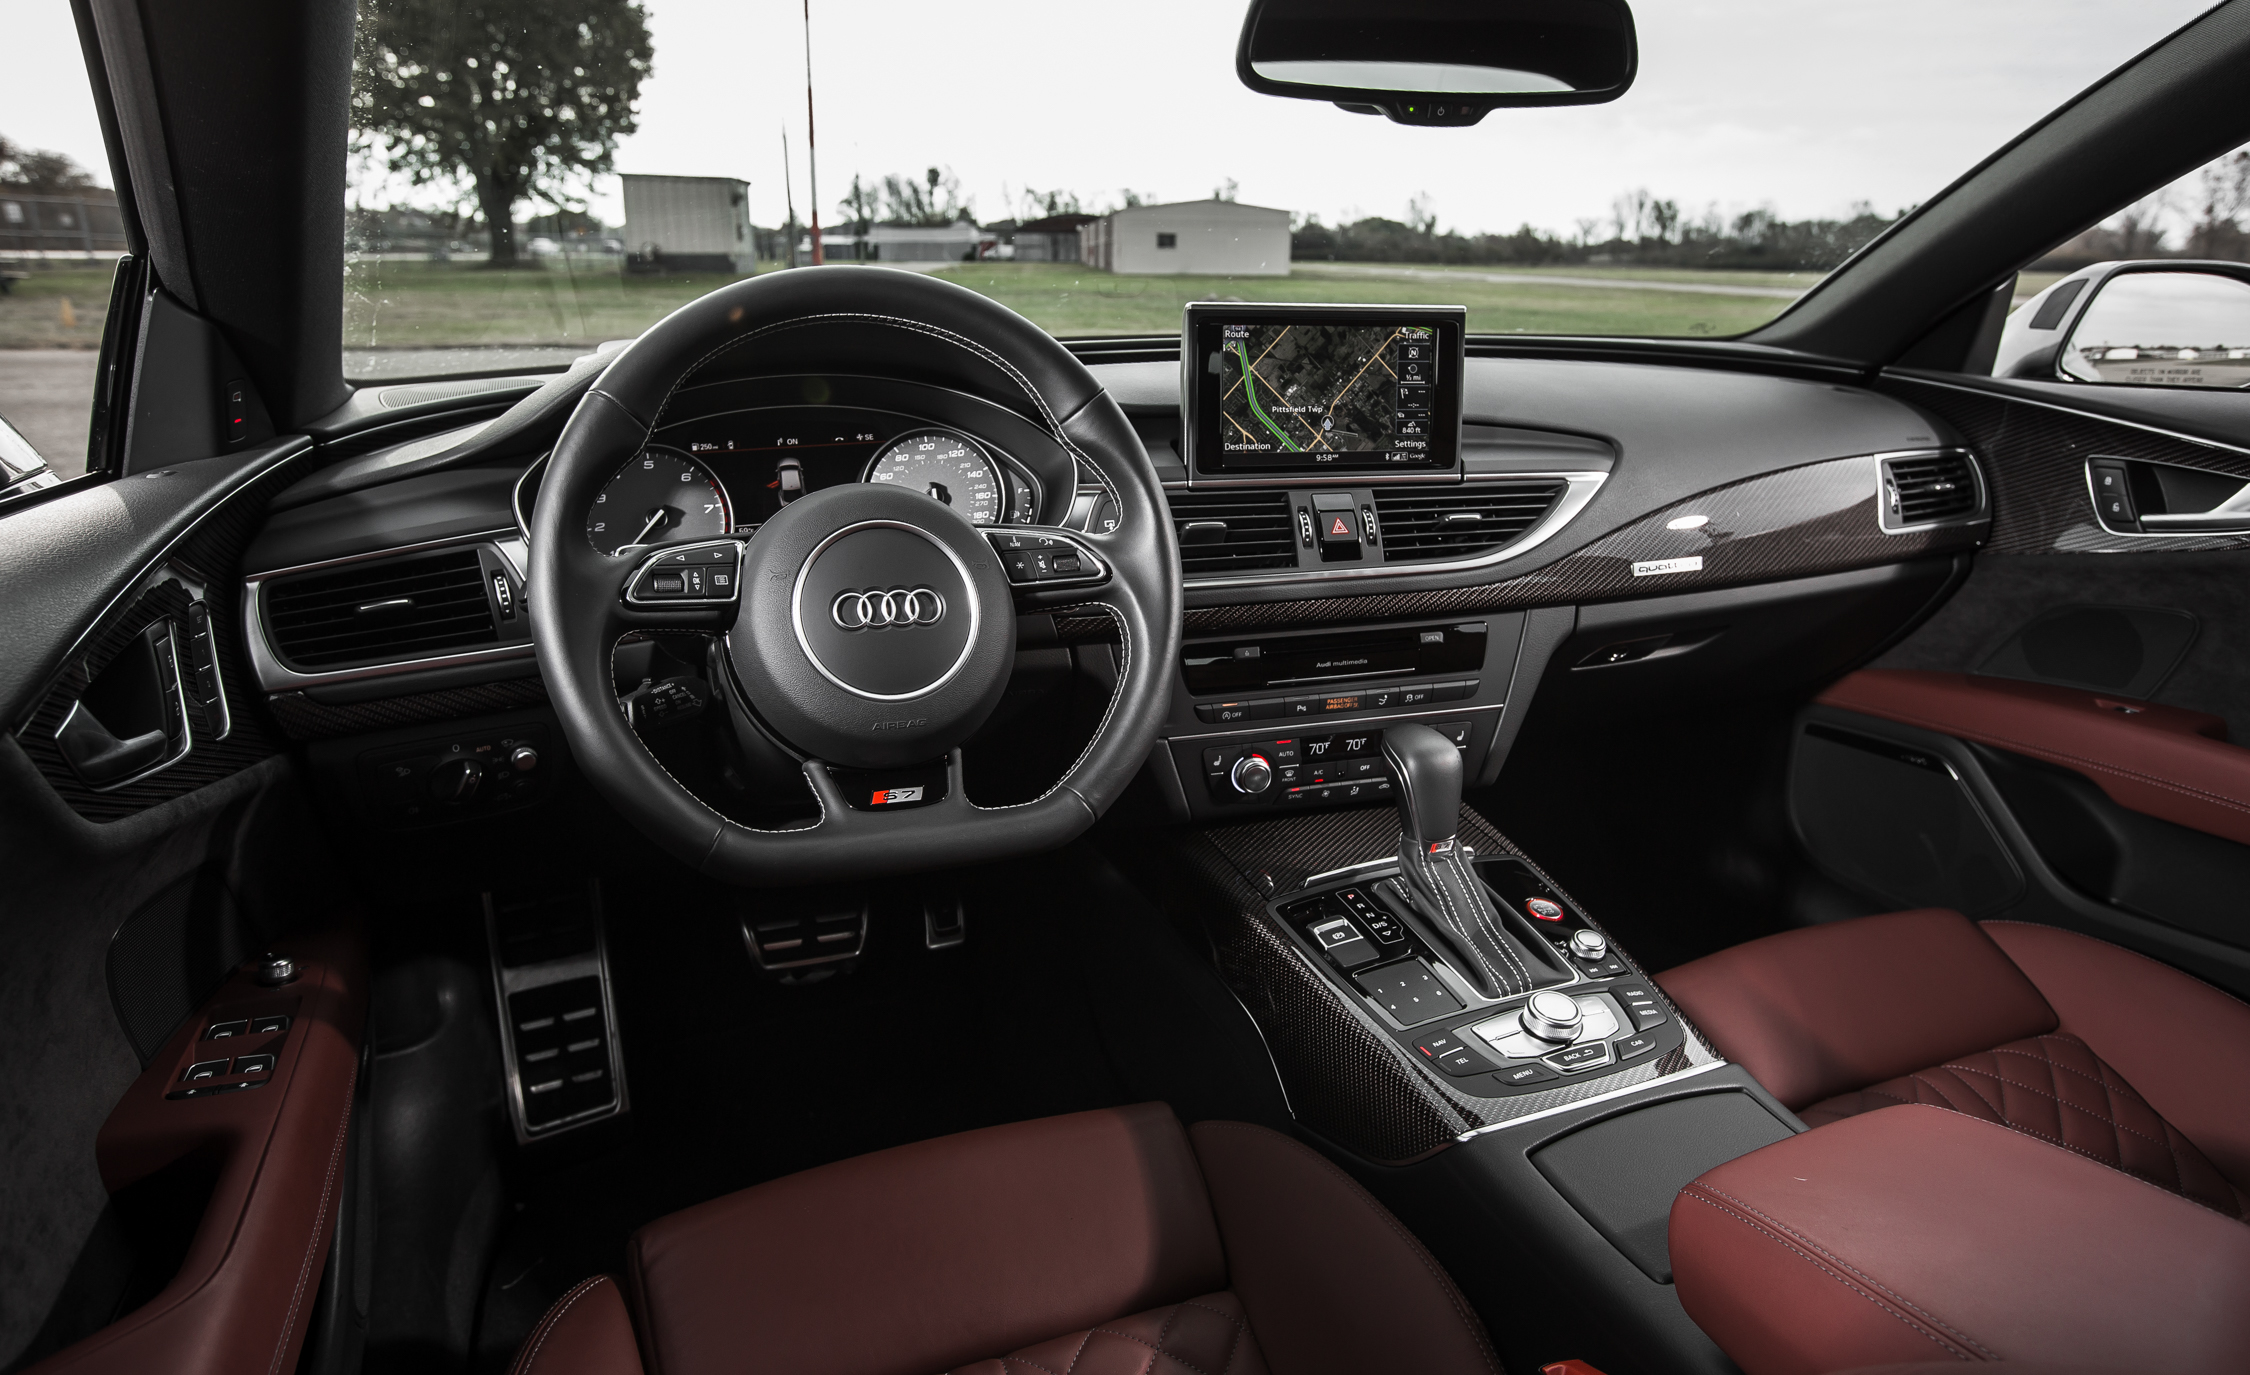 2016 Audi S7 Sedan Dashboard Interior